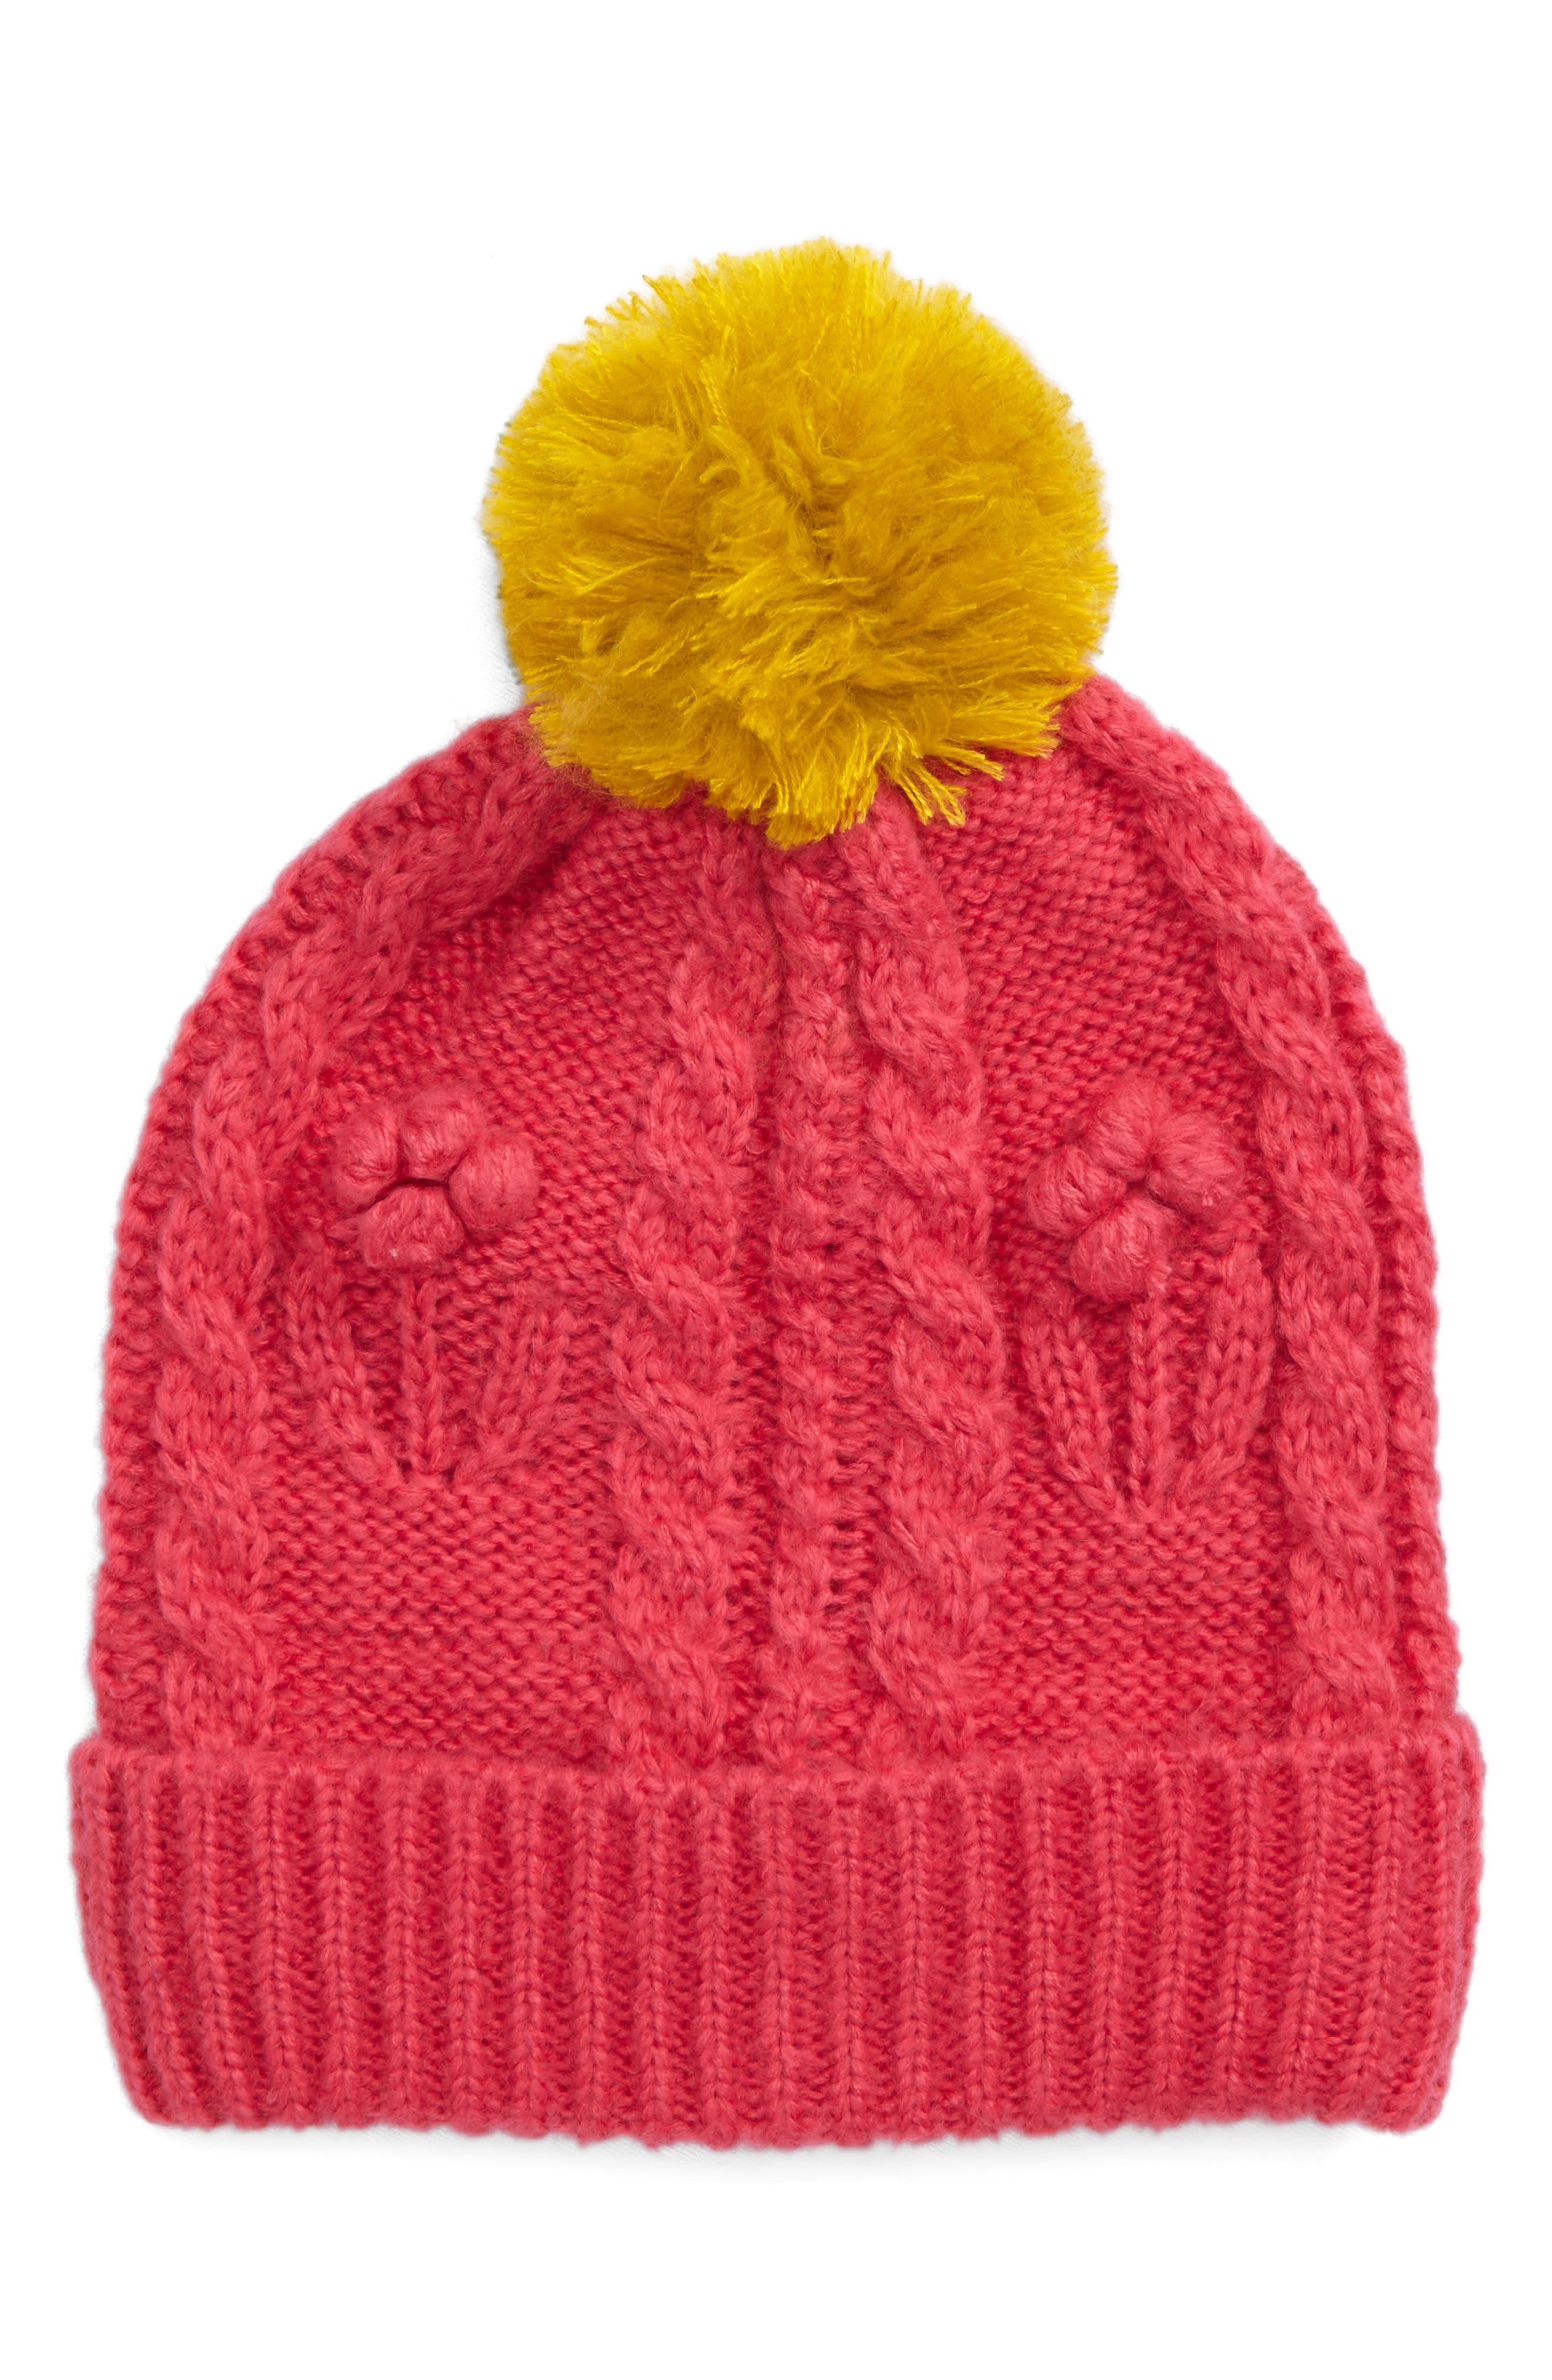 Pompom Cable Knit Beanie,                         Main,                         color,